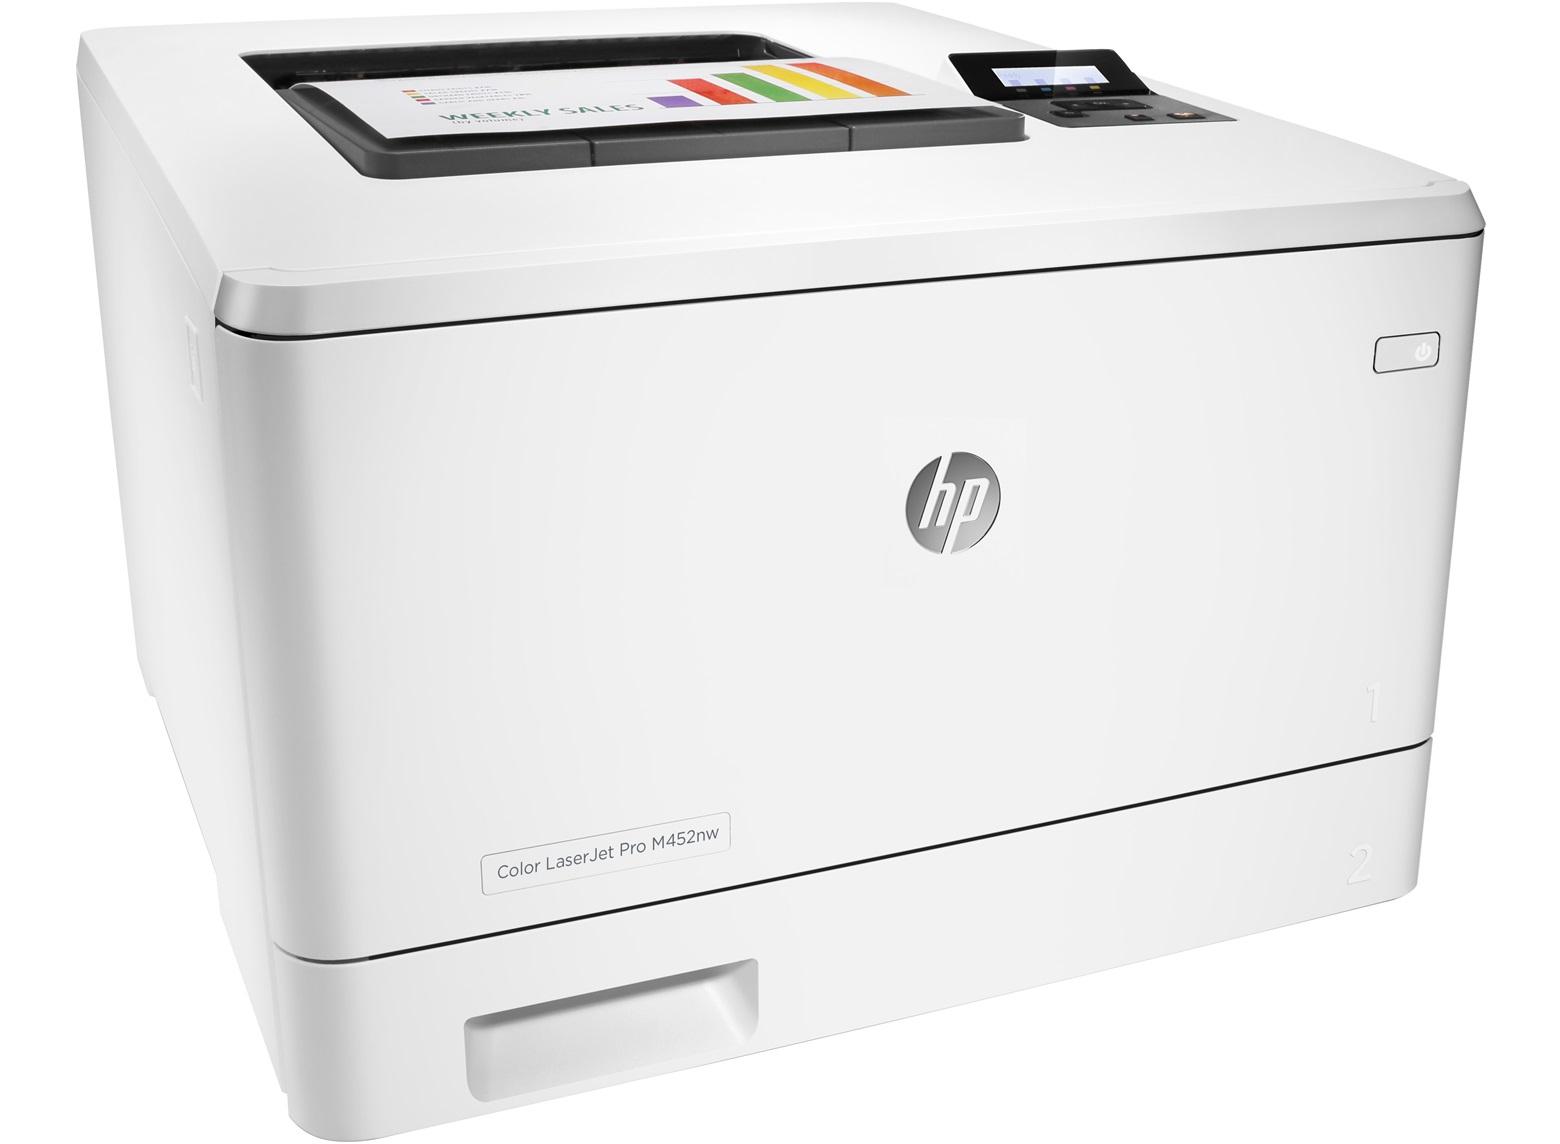 Принтер HP Color LaserJet Pro M452nw